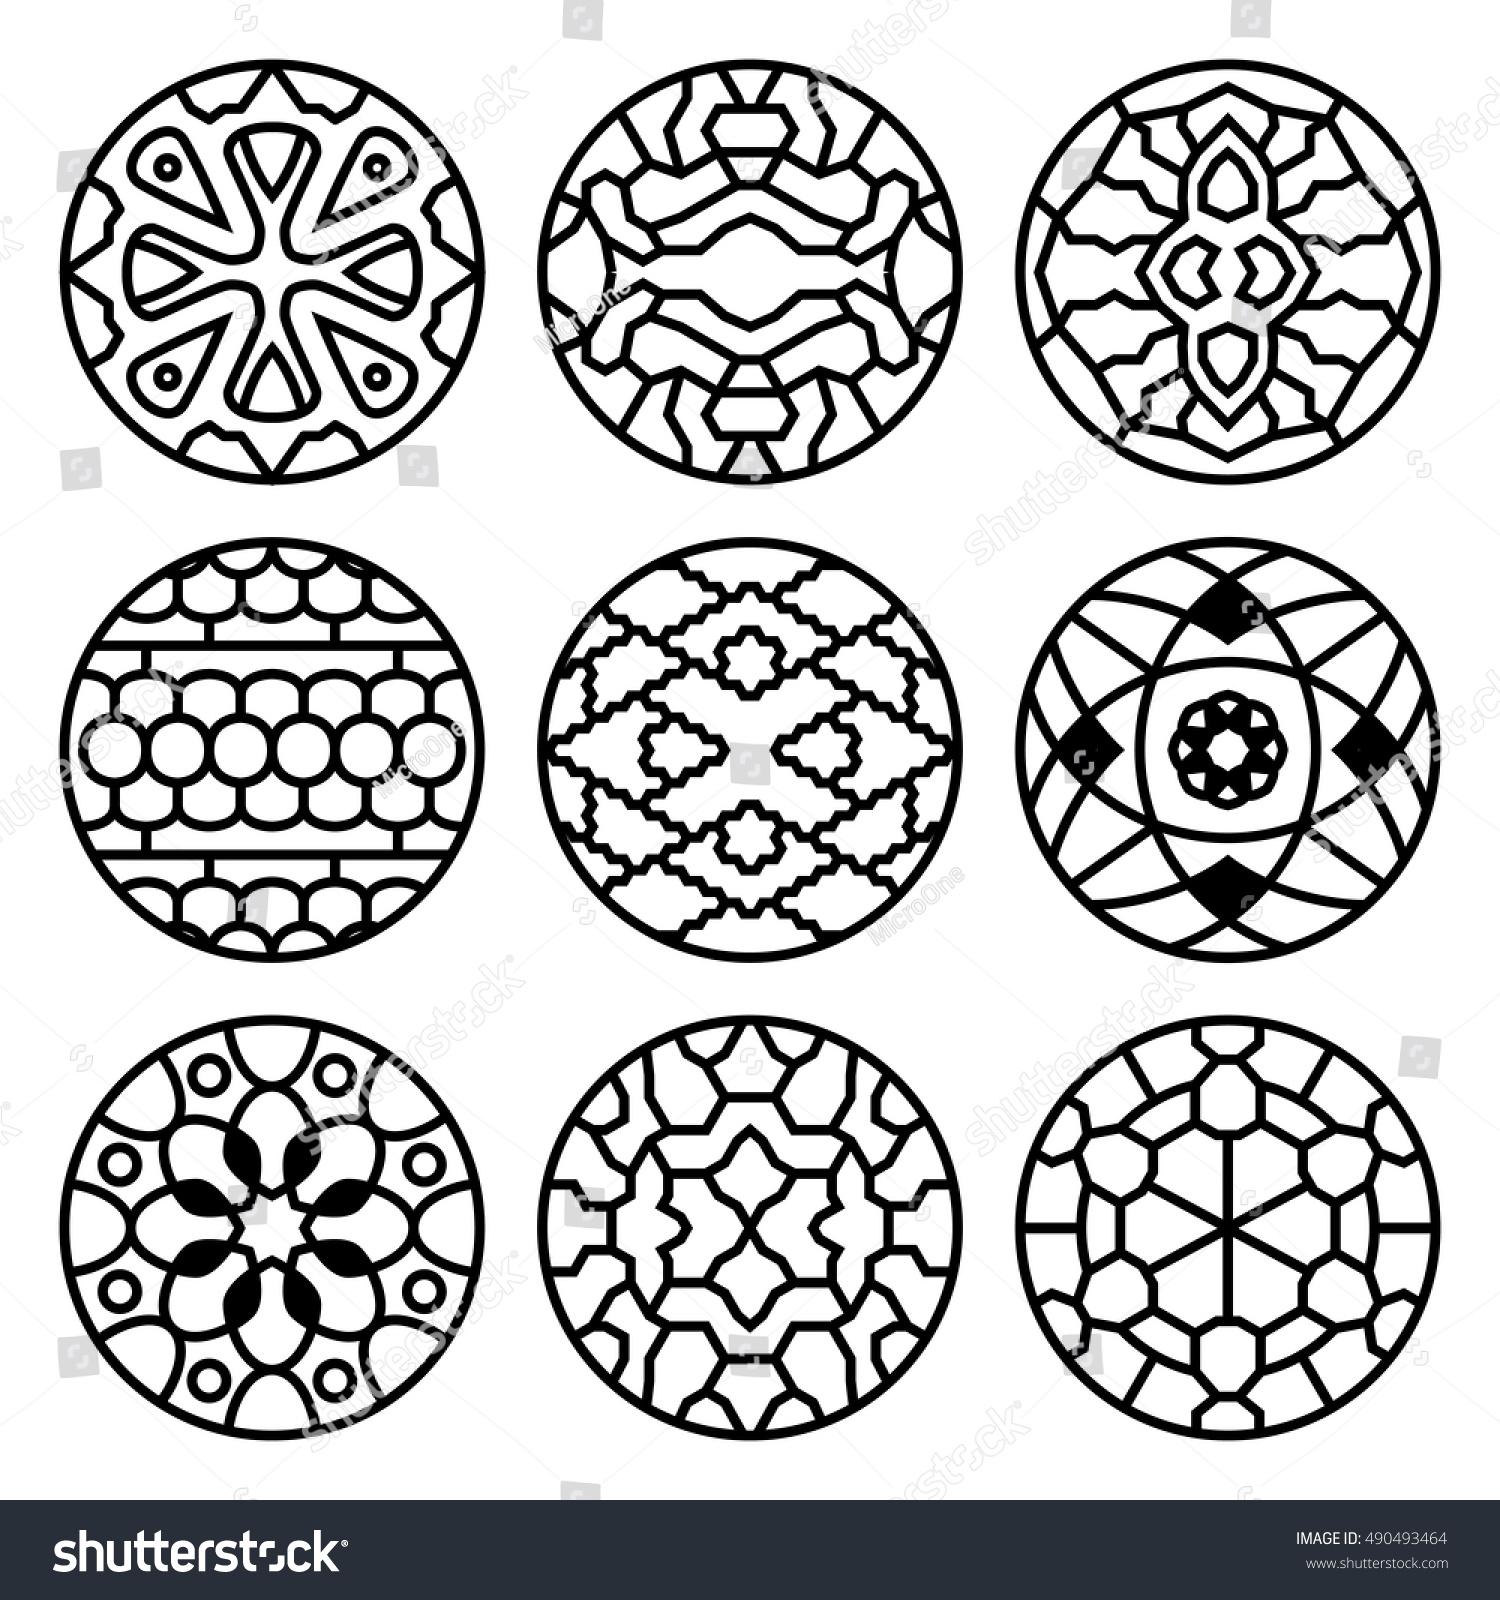 Korean traditional vector ancient buddhist patterns stock vector korean traditional vector ancient buddhist patterns ornaments and symbols tattoo oriental decorative illustration biocorpaavc Images